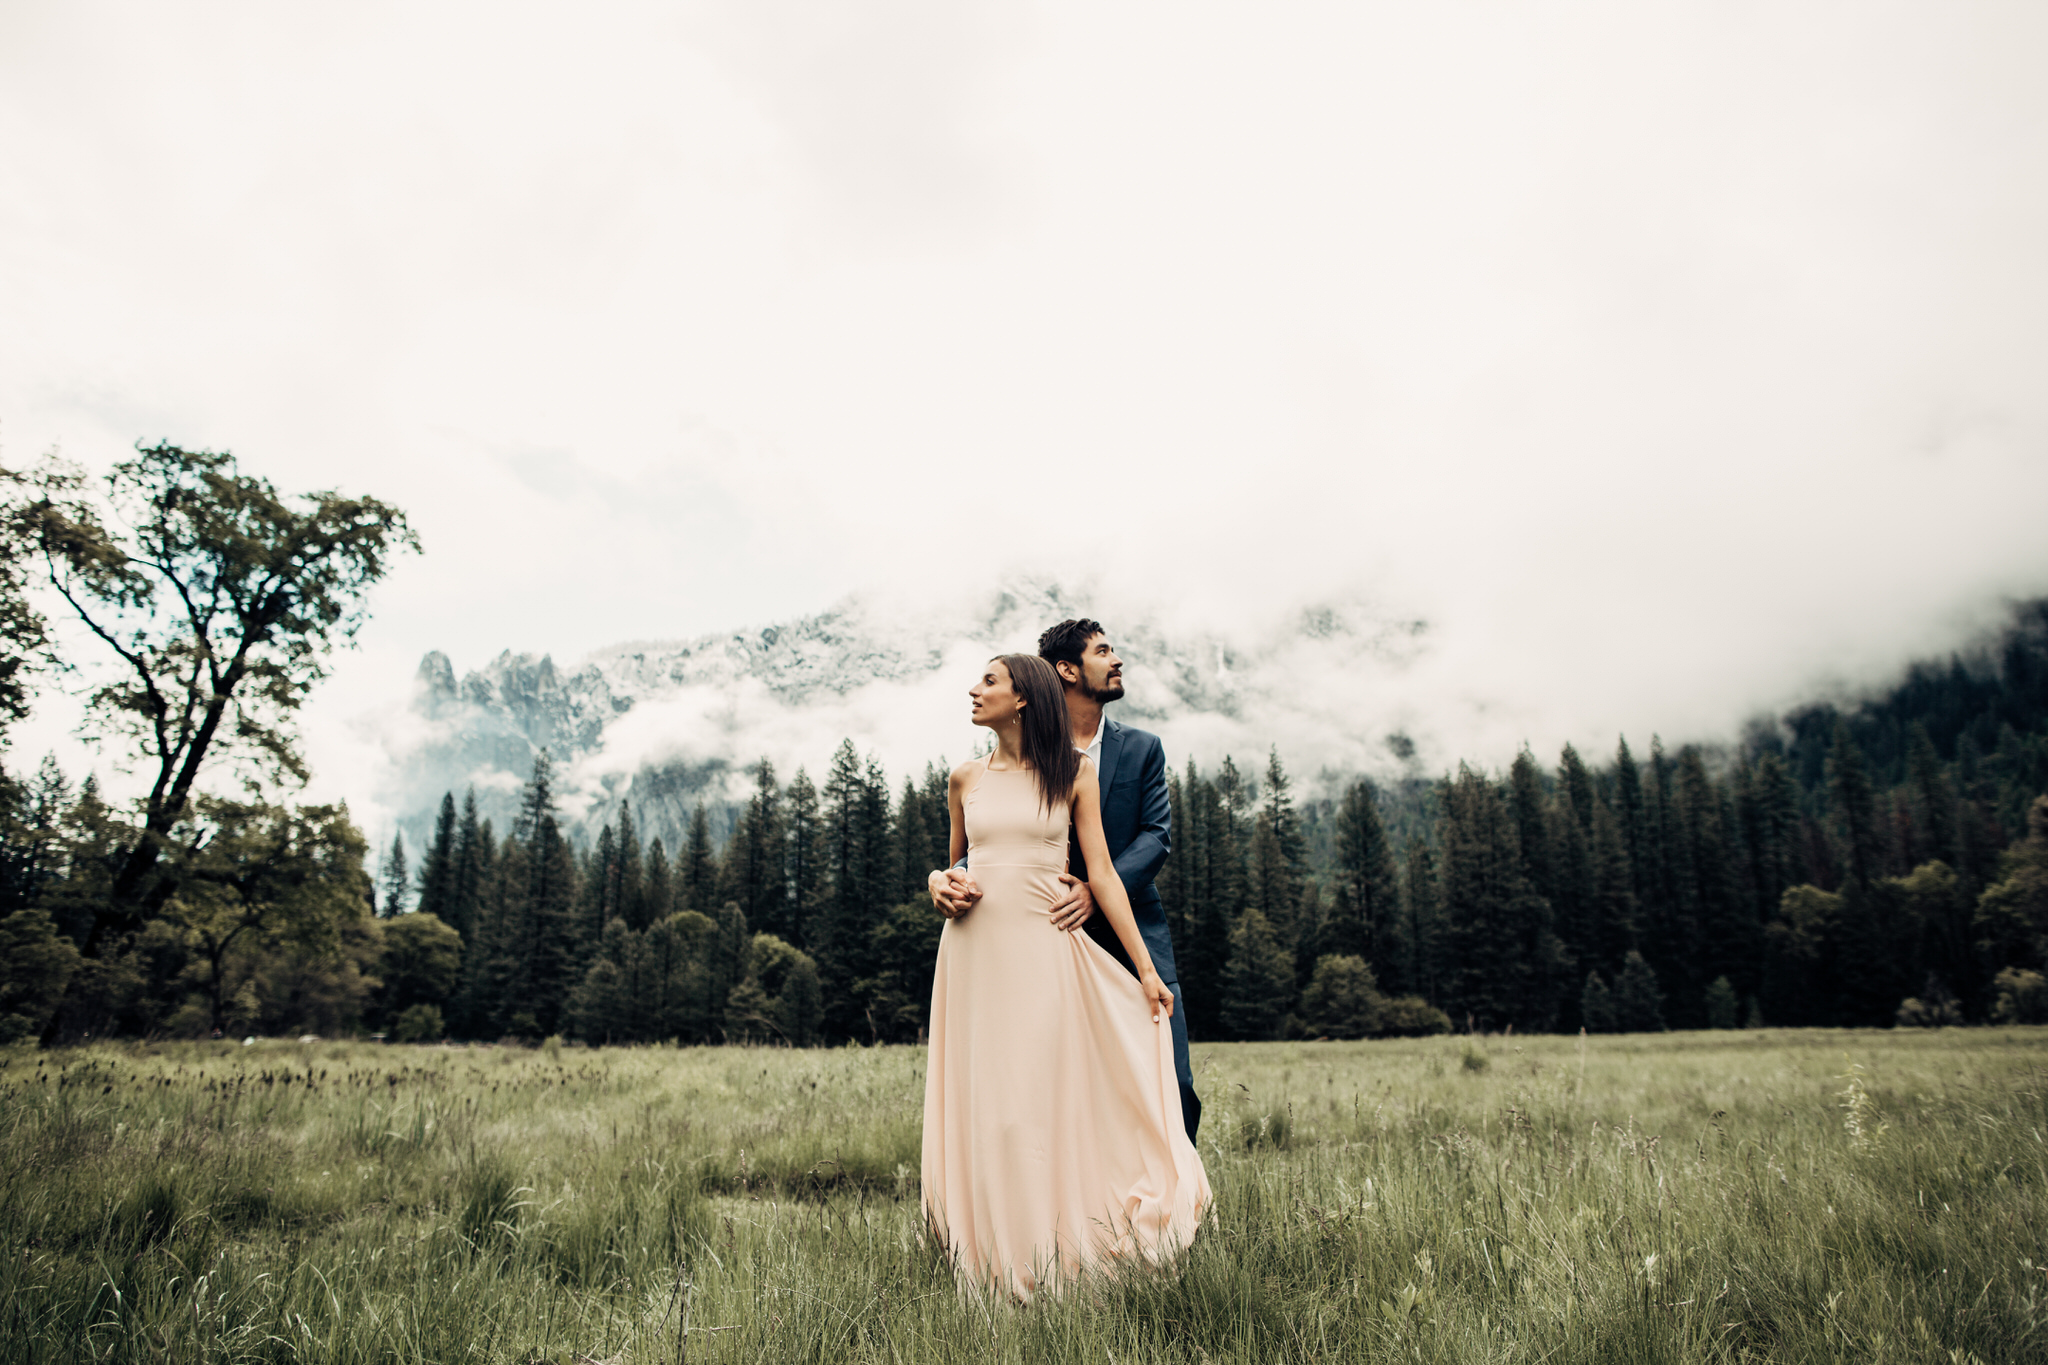 Yosemite-engagement-session-lauren-and-tom66.jpg